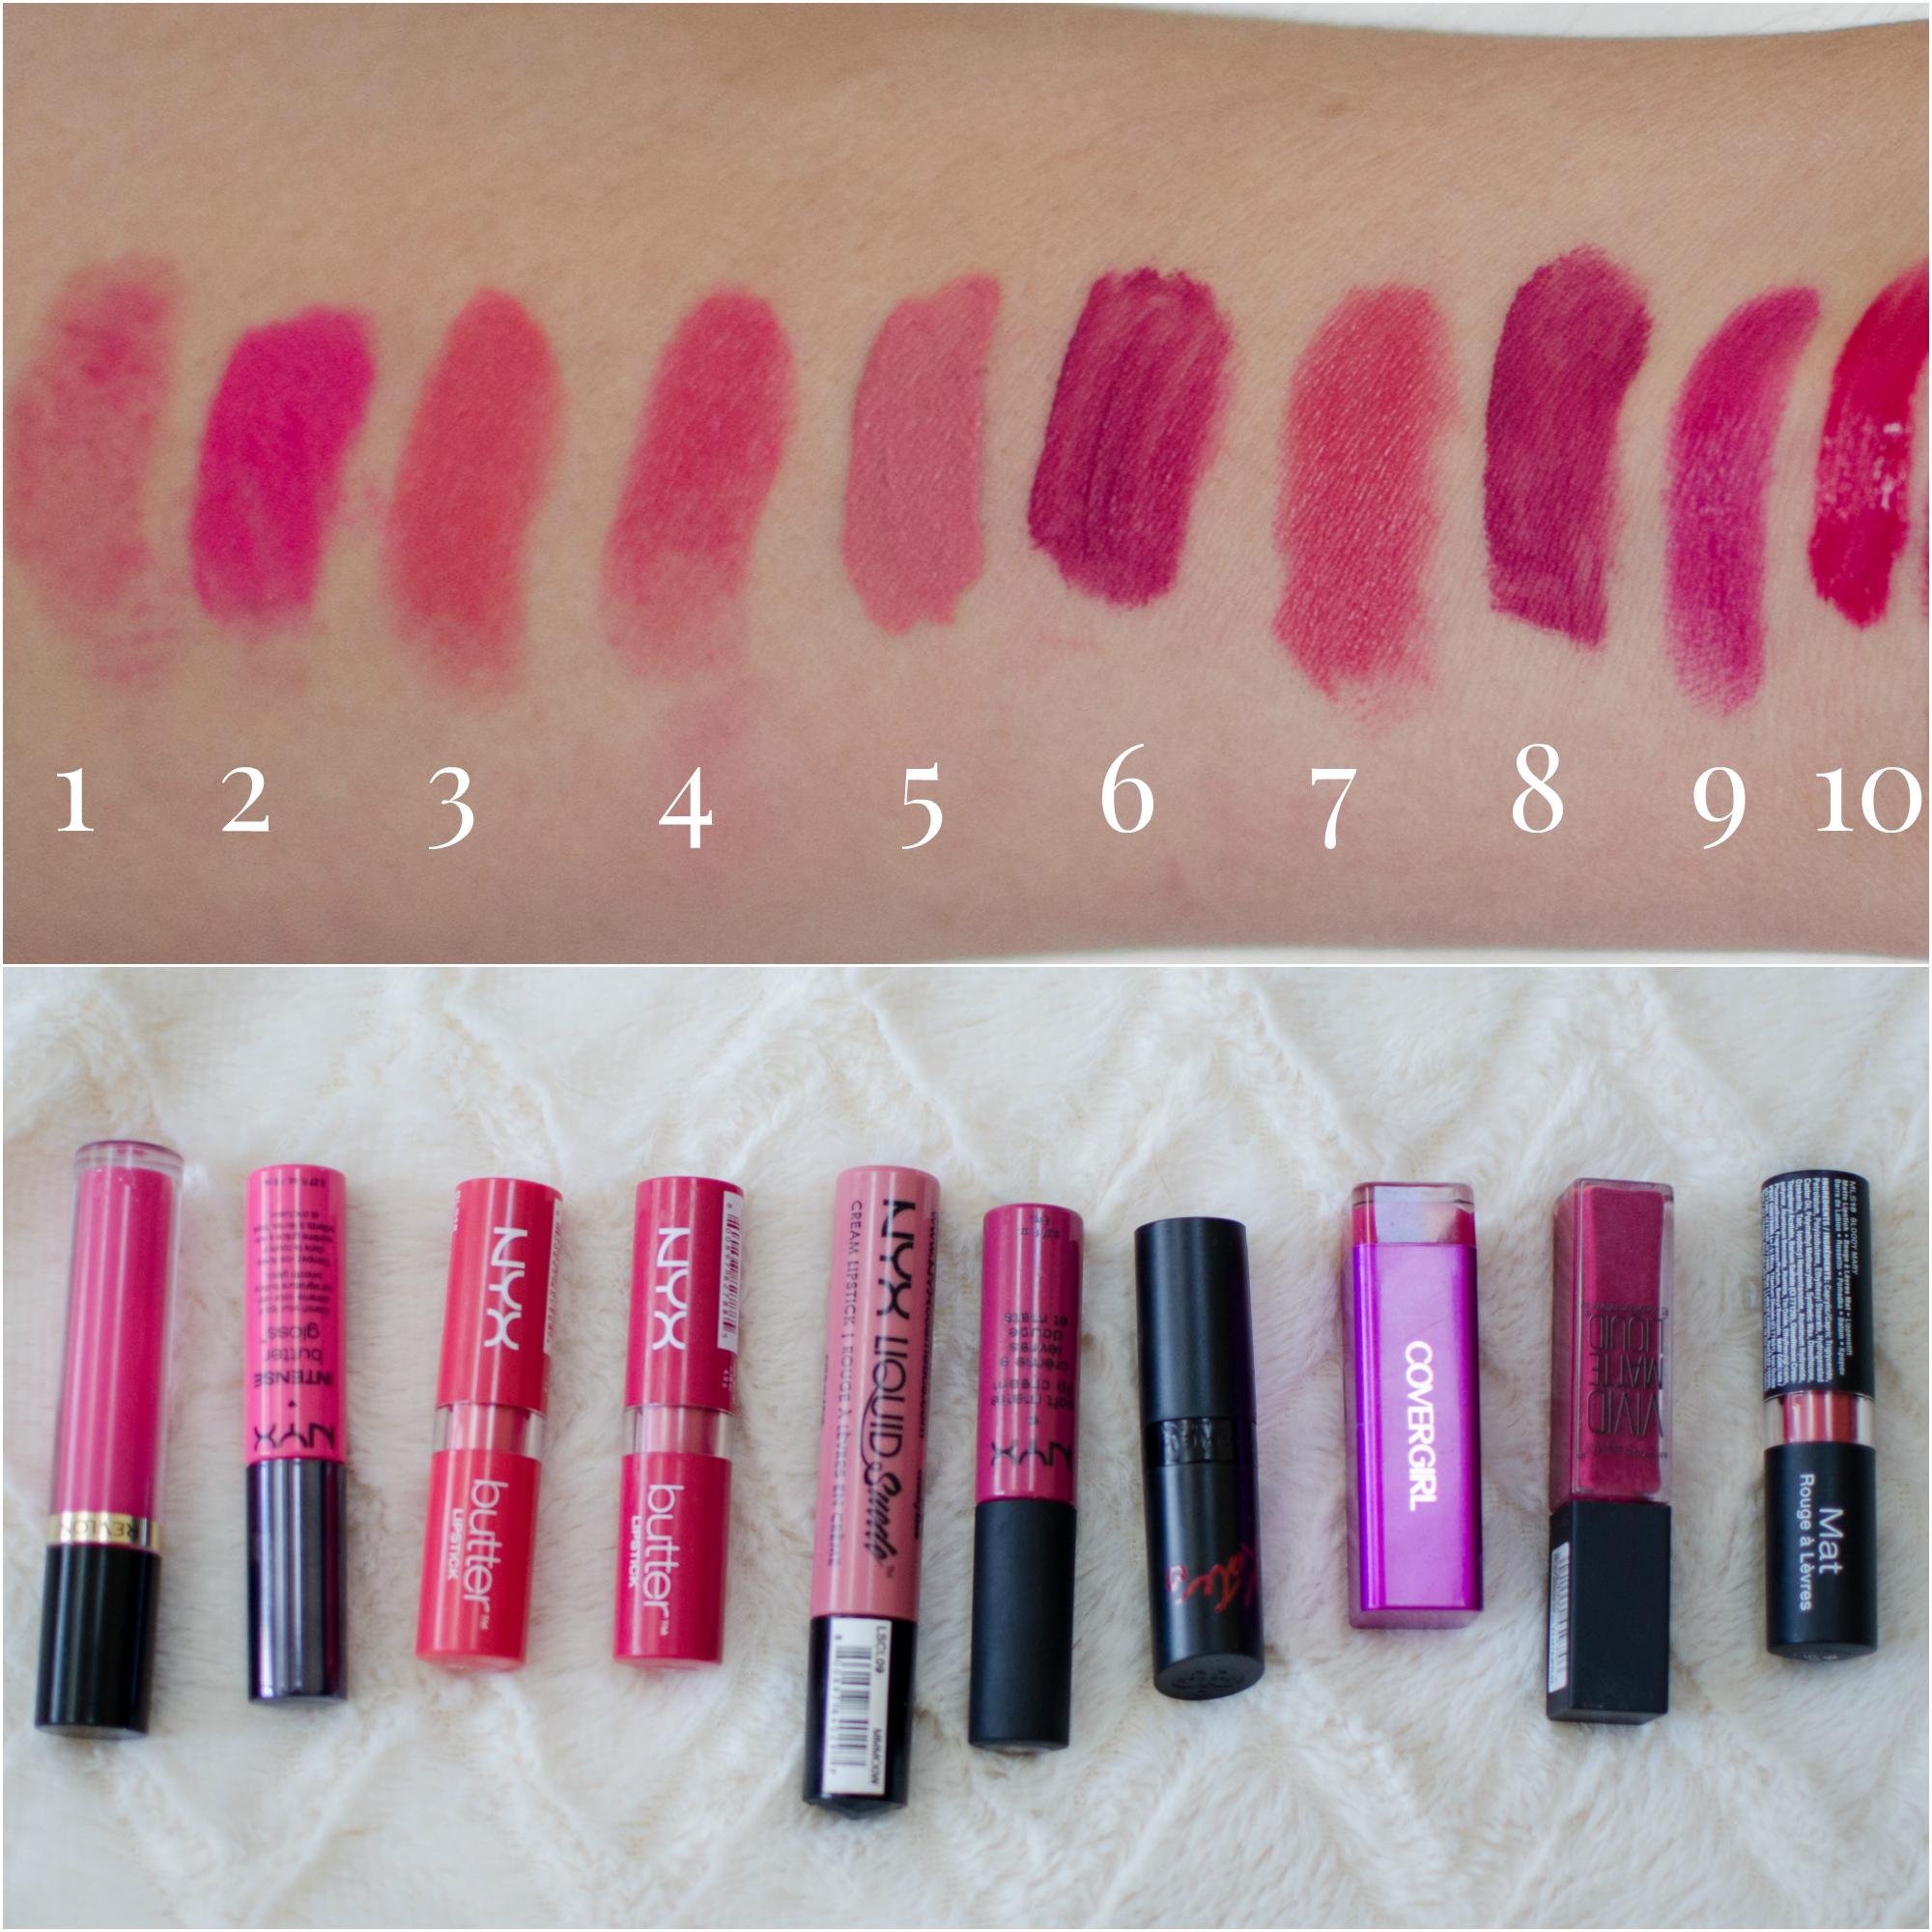 best drugstore pink lipstick swatches | www.bylaurenm.com